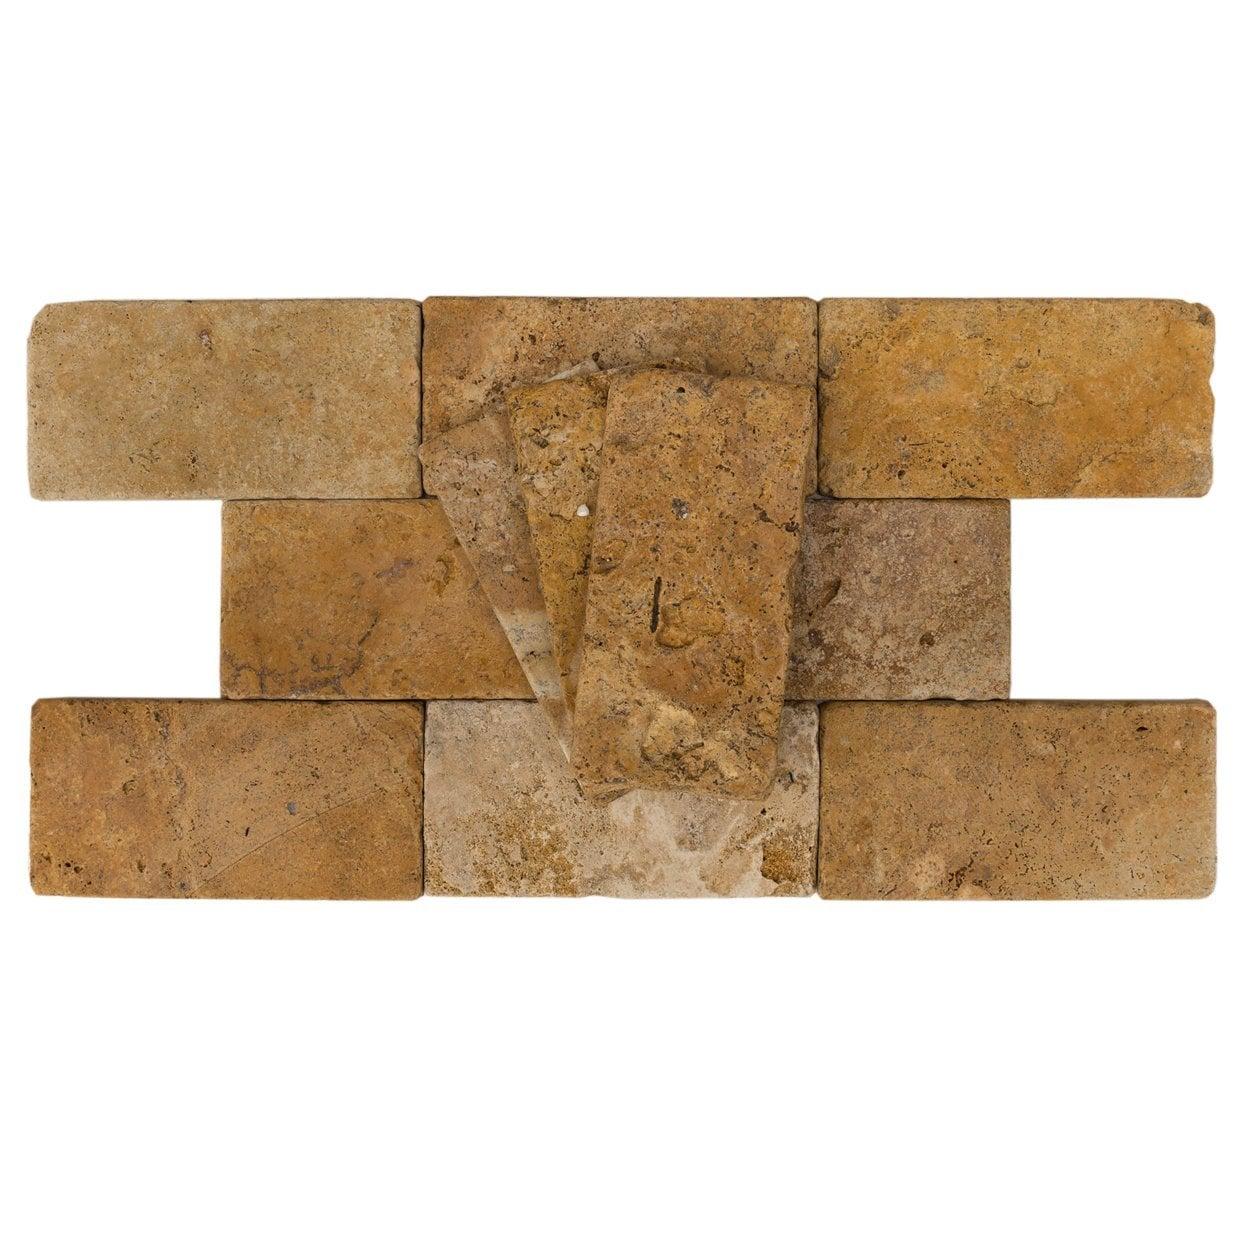 "Gold-Rustic-Yellow / 3""x6""x3/8"" / Tumbled Antique Tumbled Travertine Backsplash Tiles 0"